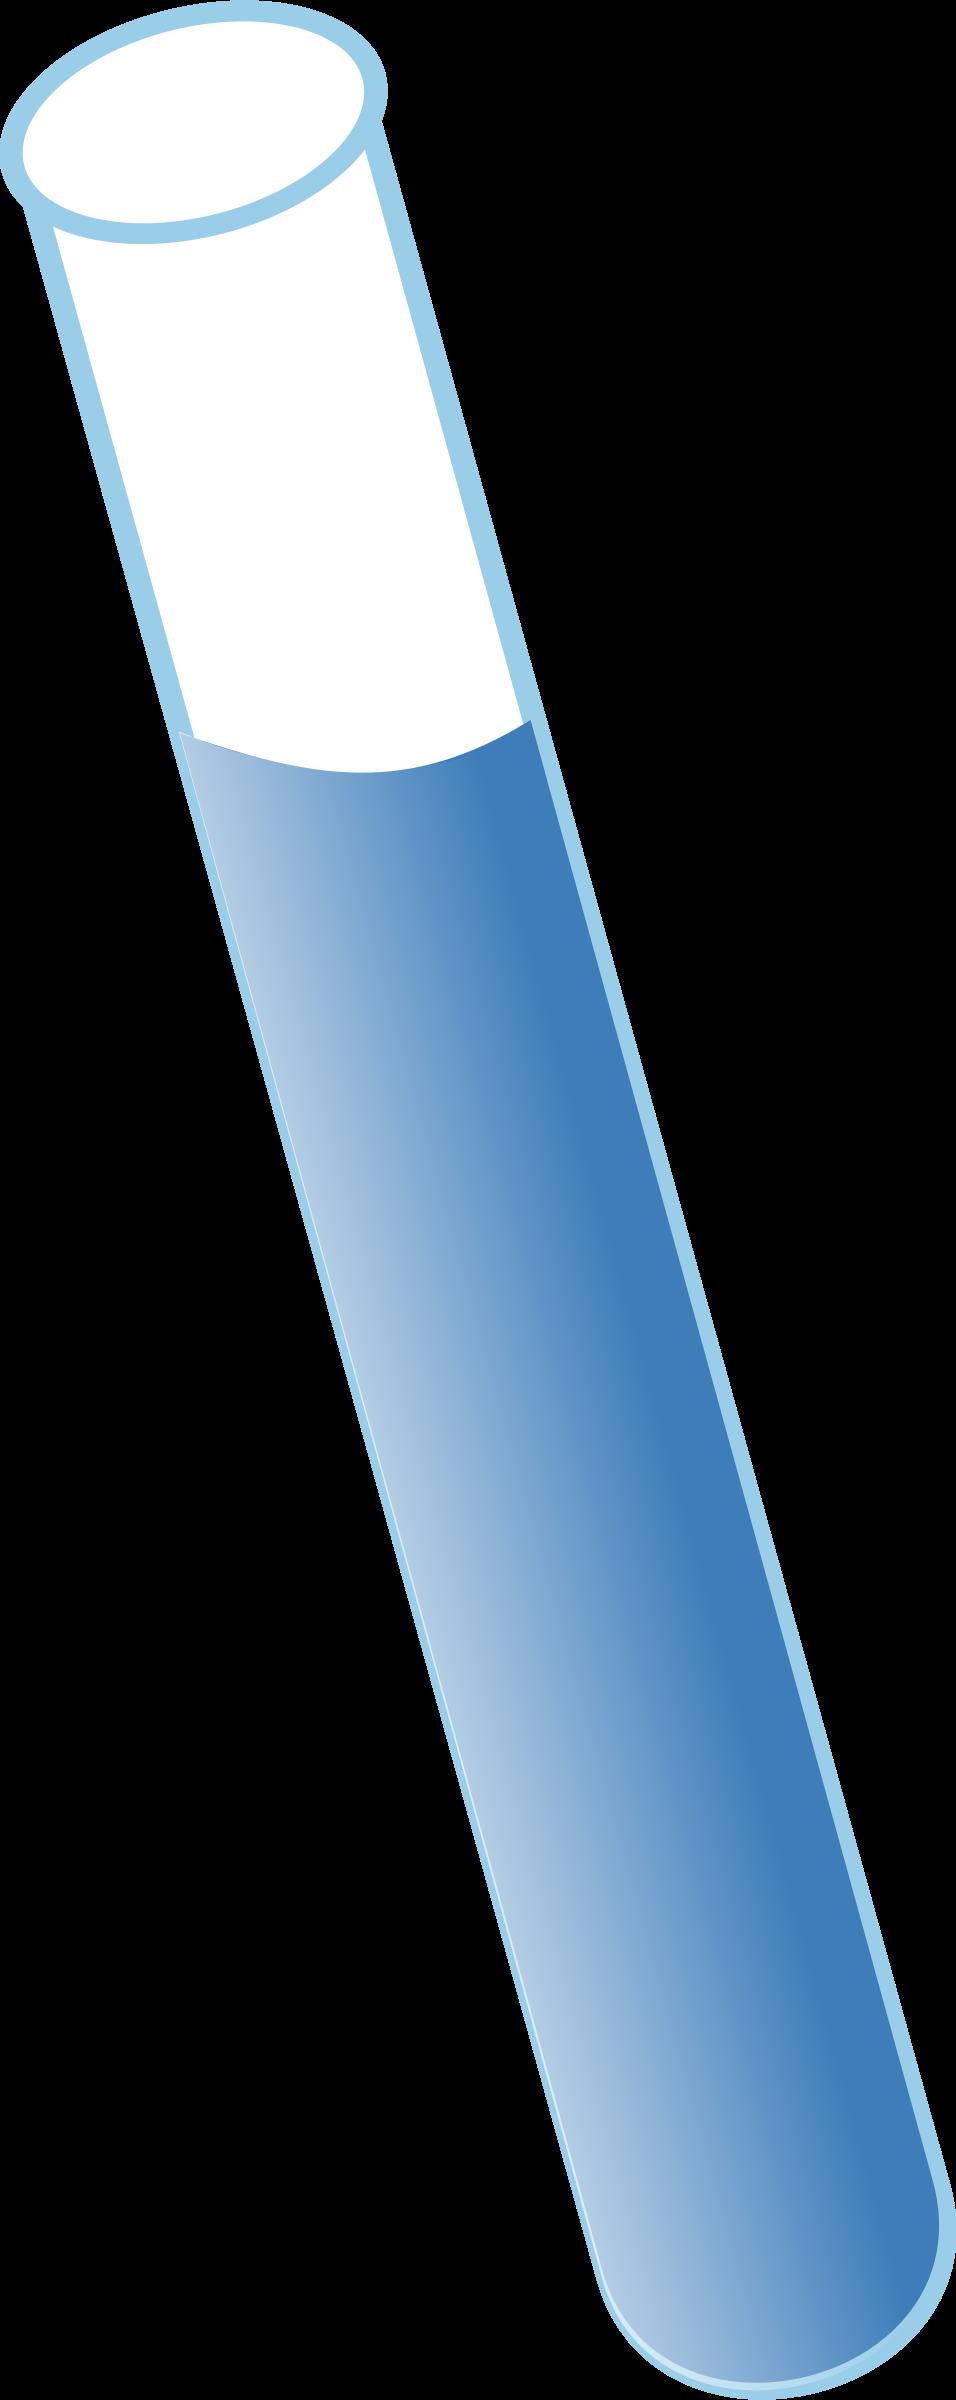 Test Tube Clipart.